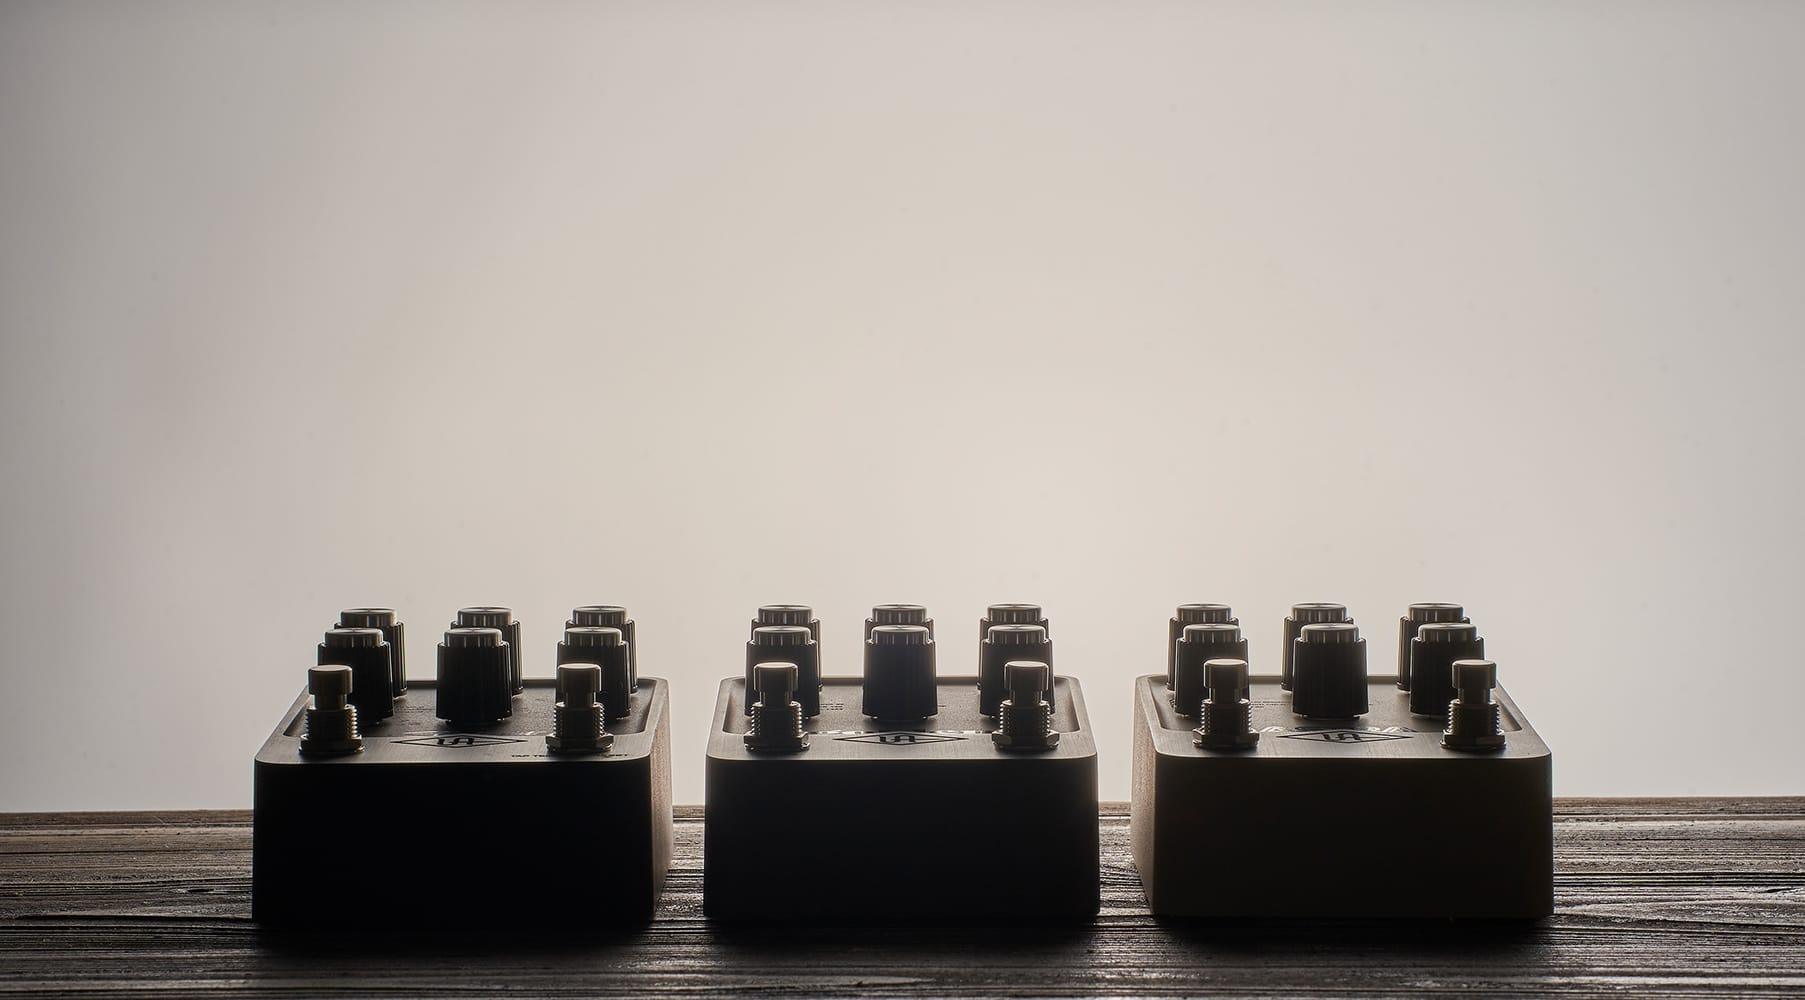 Universal Audio UAFX ペダル・シリーズ「リバーブ」「ディレイ」「モジュレーション」の3機種を発表!